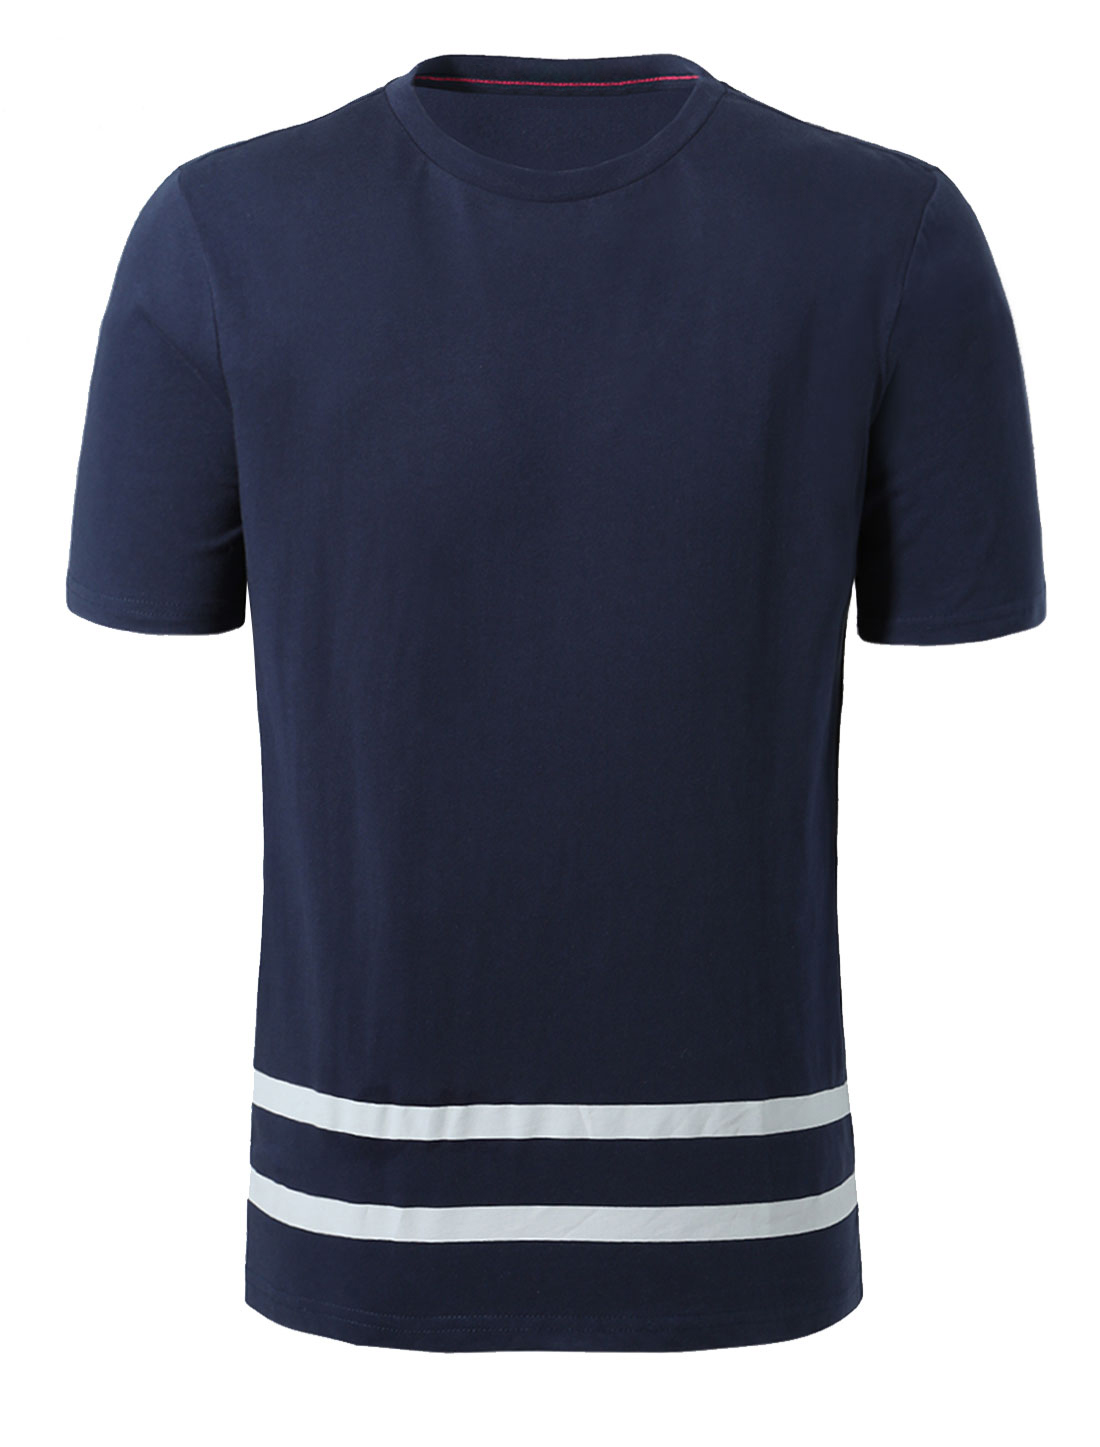 Men Crew Neck Contrast Printed Stripe Cotton Short Sleeves T-Shirt Tee Navy Blue S